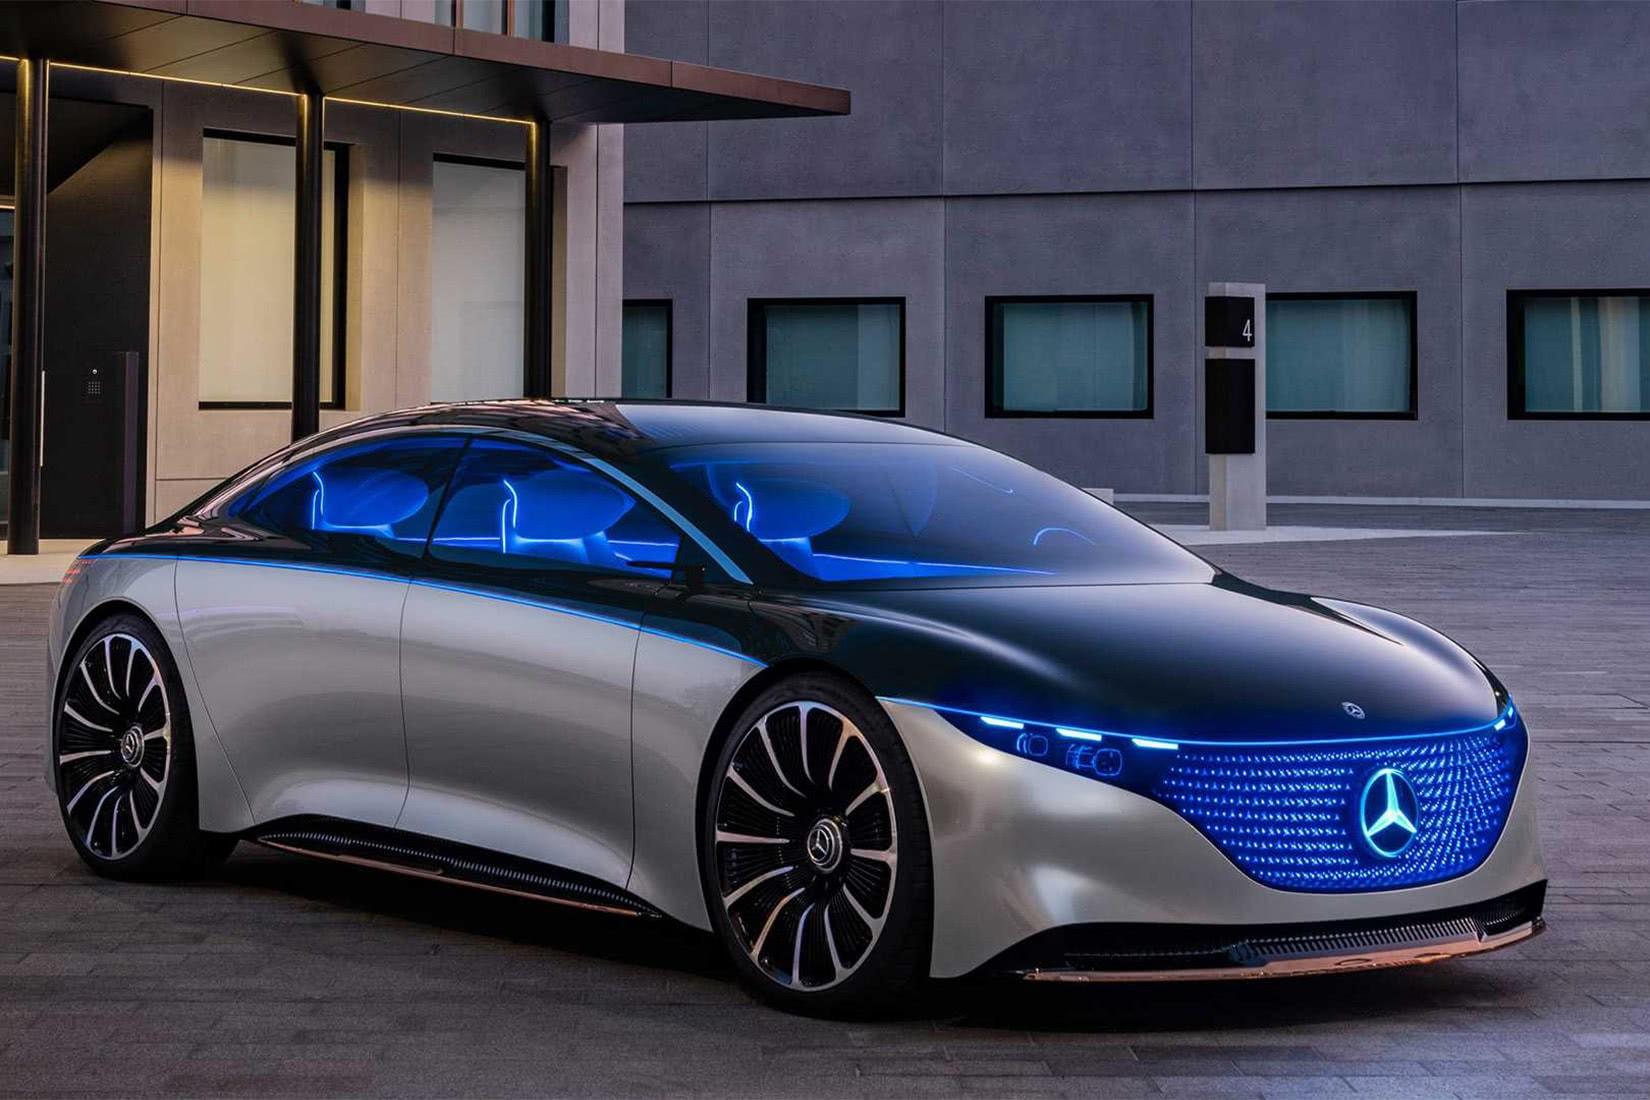 best luxury car brand Mercedes-Benz - Luxe Digital